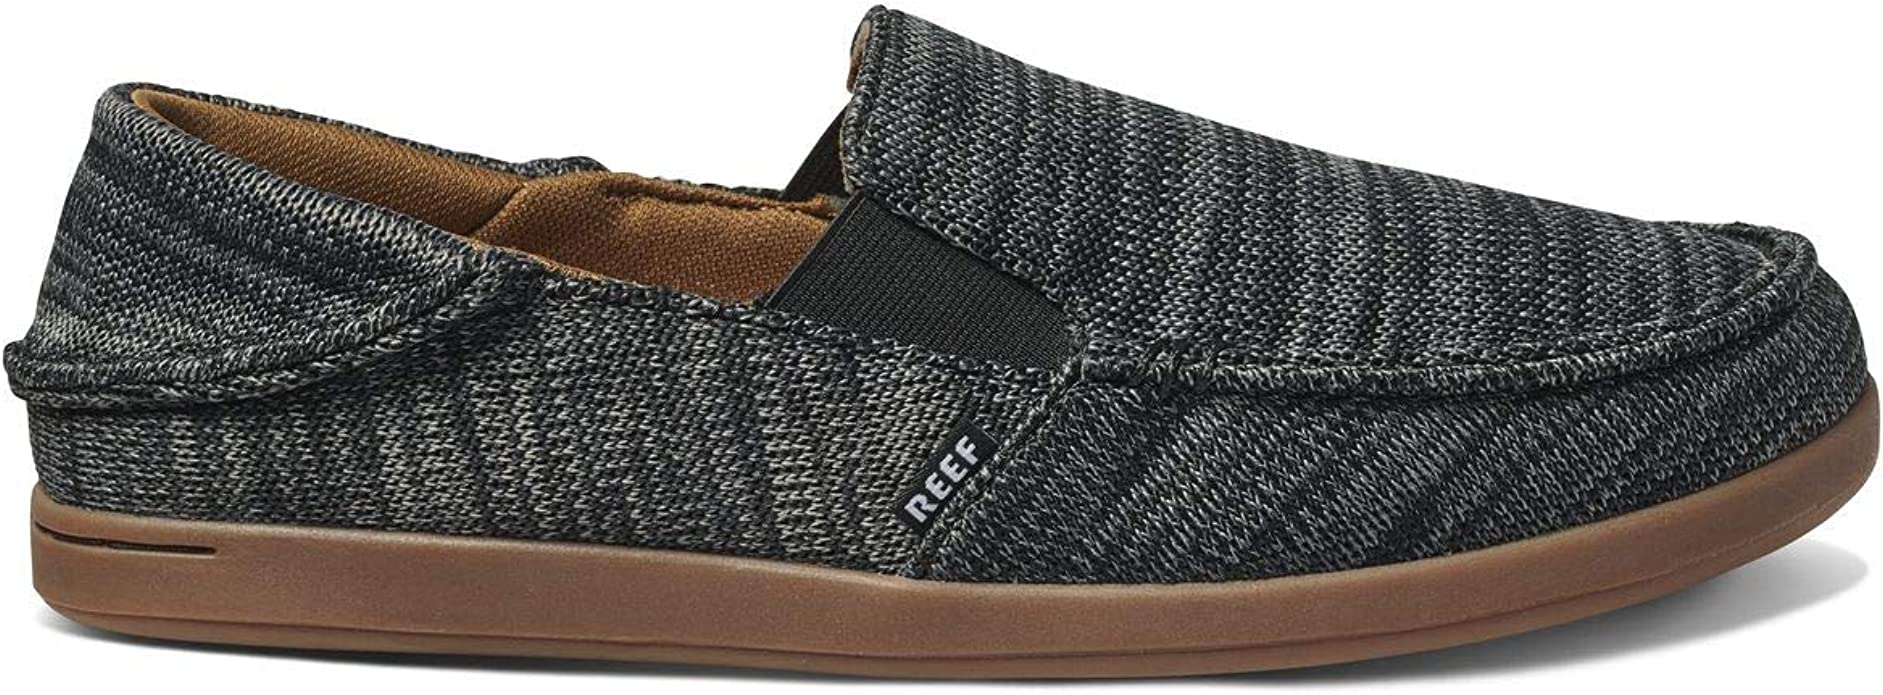 Shoes | Cushion Matey Knit, Black/Gum